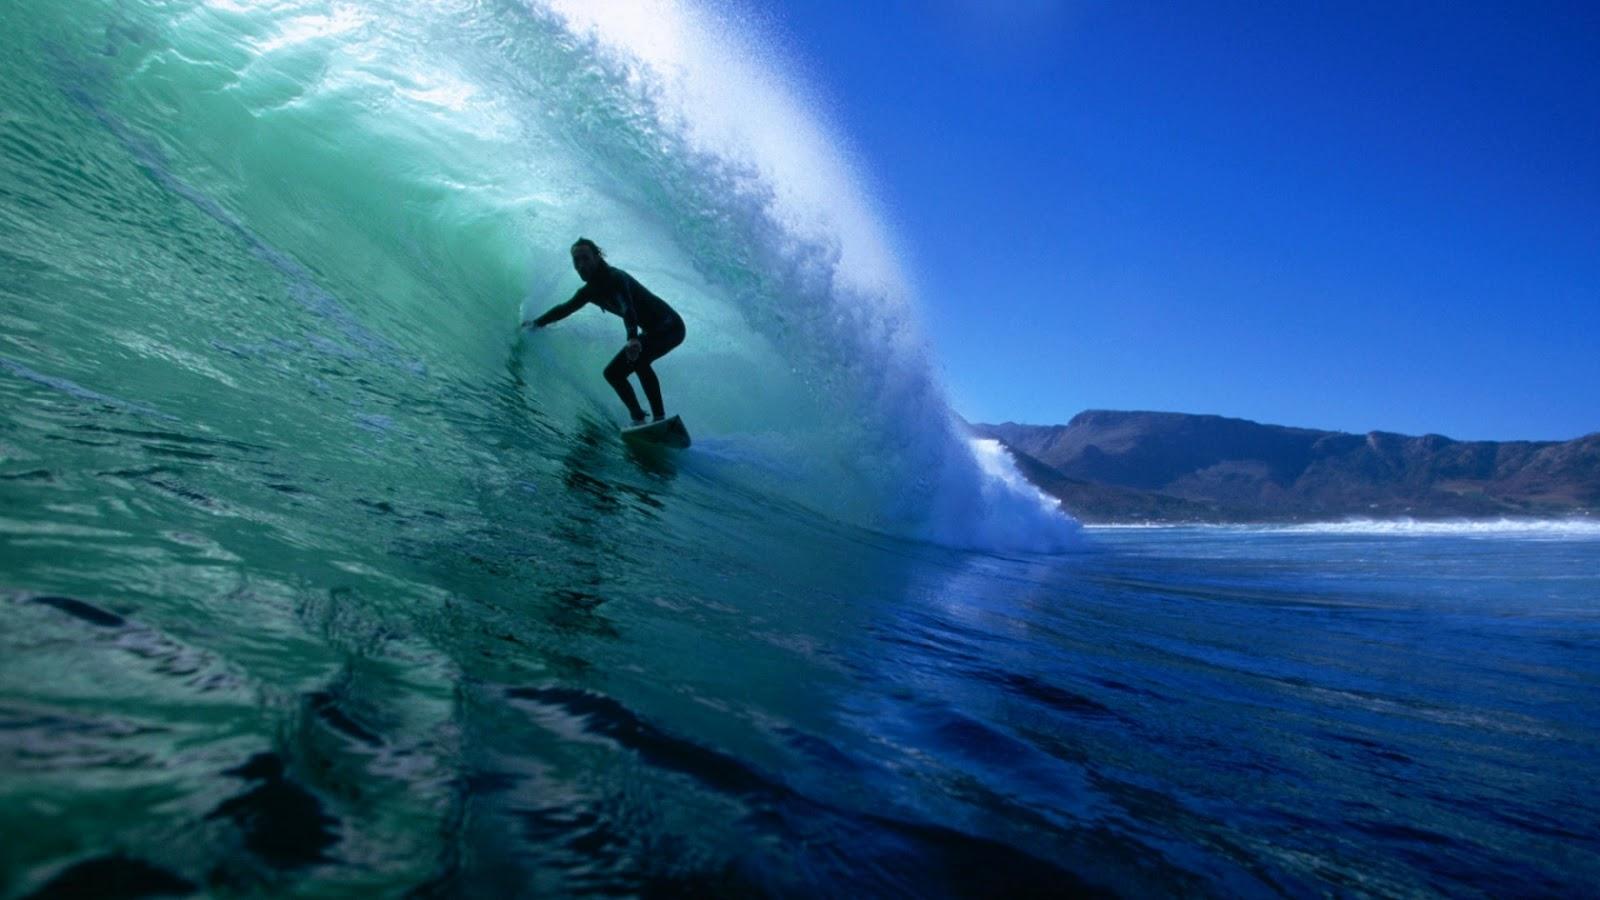 http://2.bp.blogspot.com/-au3eTmrdZnk/UA309aYI9PI/AAAAAAAAAm0/sV7NBu4YWfA/s1600/under-the-wave-wallpapers_9237_1680x1050.jpg